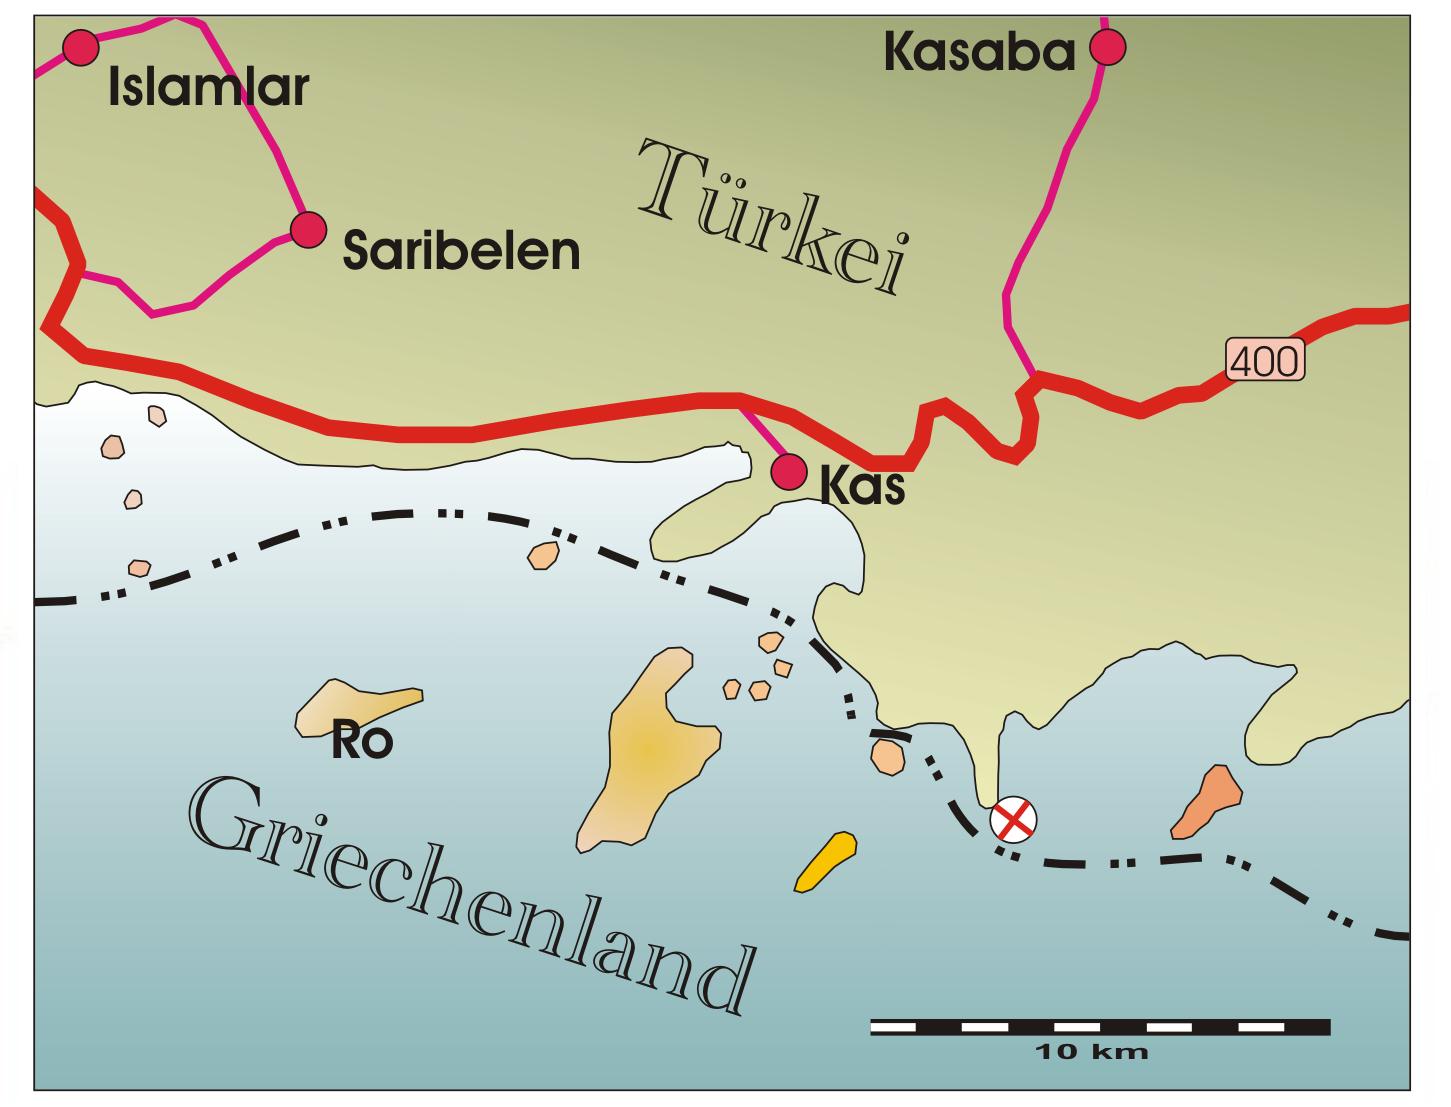 http://upload.wikimedia.org/wikipedia/commons/d/d5/Schiff_von_Uluburun_Fundort.png